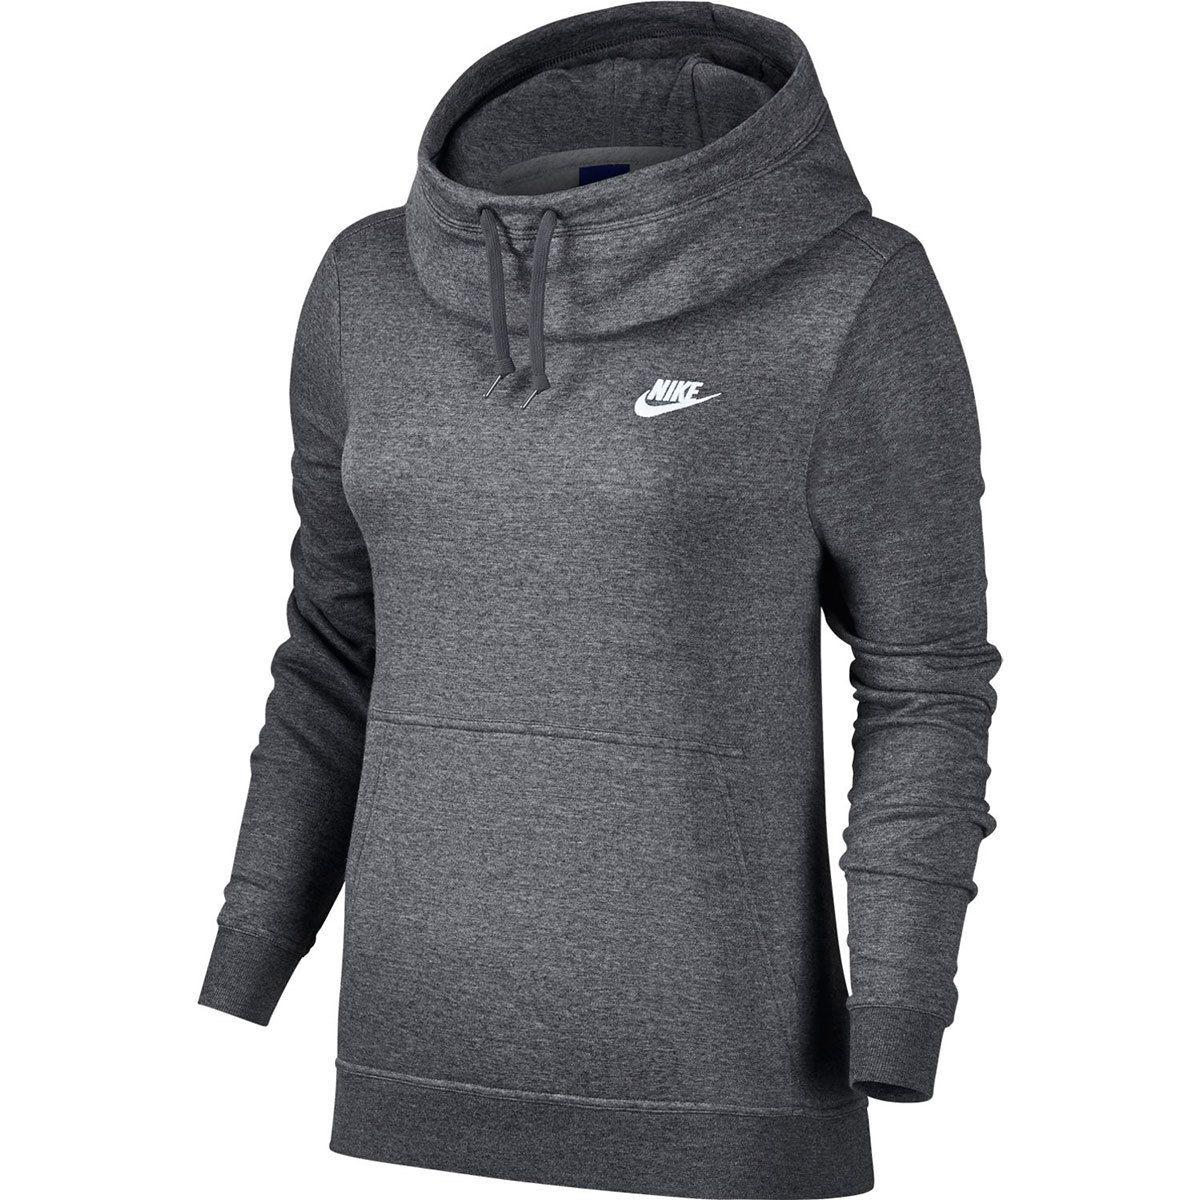 Nike Women S Nsw Fleece Funnel Neck Pullover Hoodie Bob S Stores Funnel Neck Hoodie Nike Sportswear Women Sportswear Women [ 1200 x 1200 Pixel ]